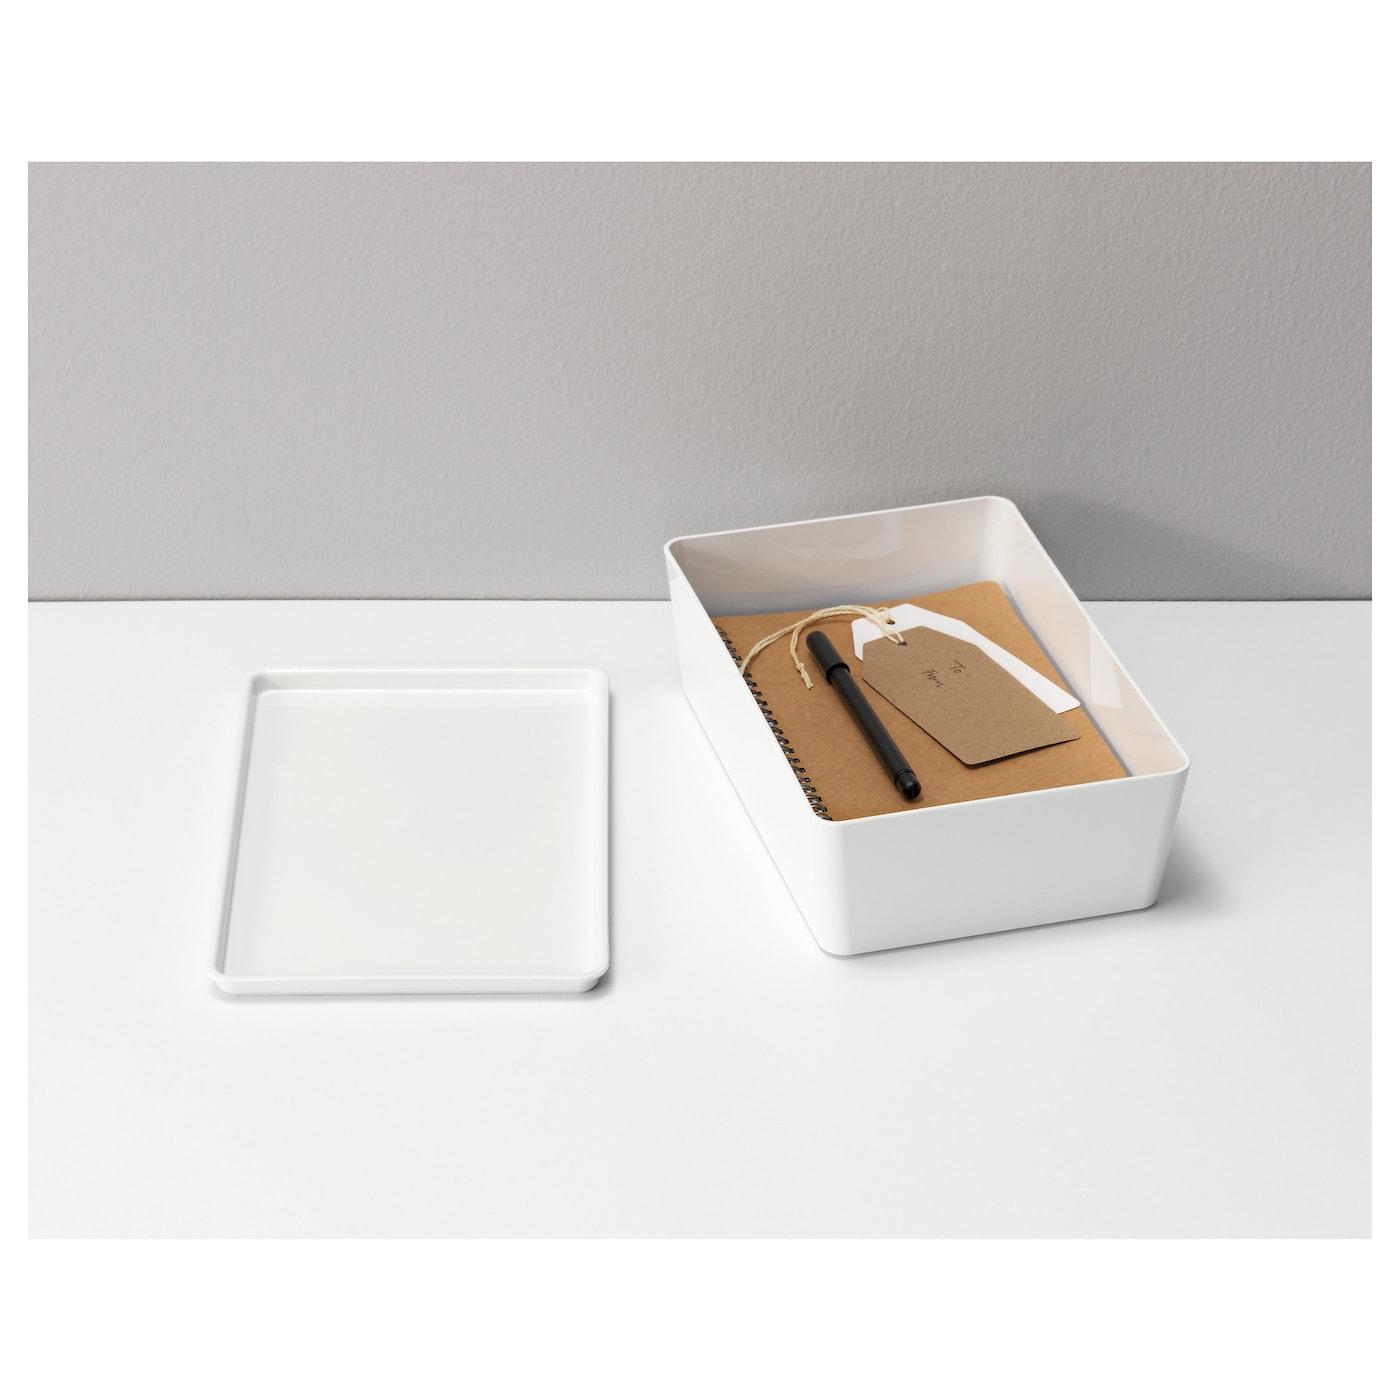 kuggis bo te avec couvercle blanc 18x26x8 cm ikea. Black Bedroom Furniture Sets. Home Design Ideas